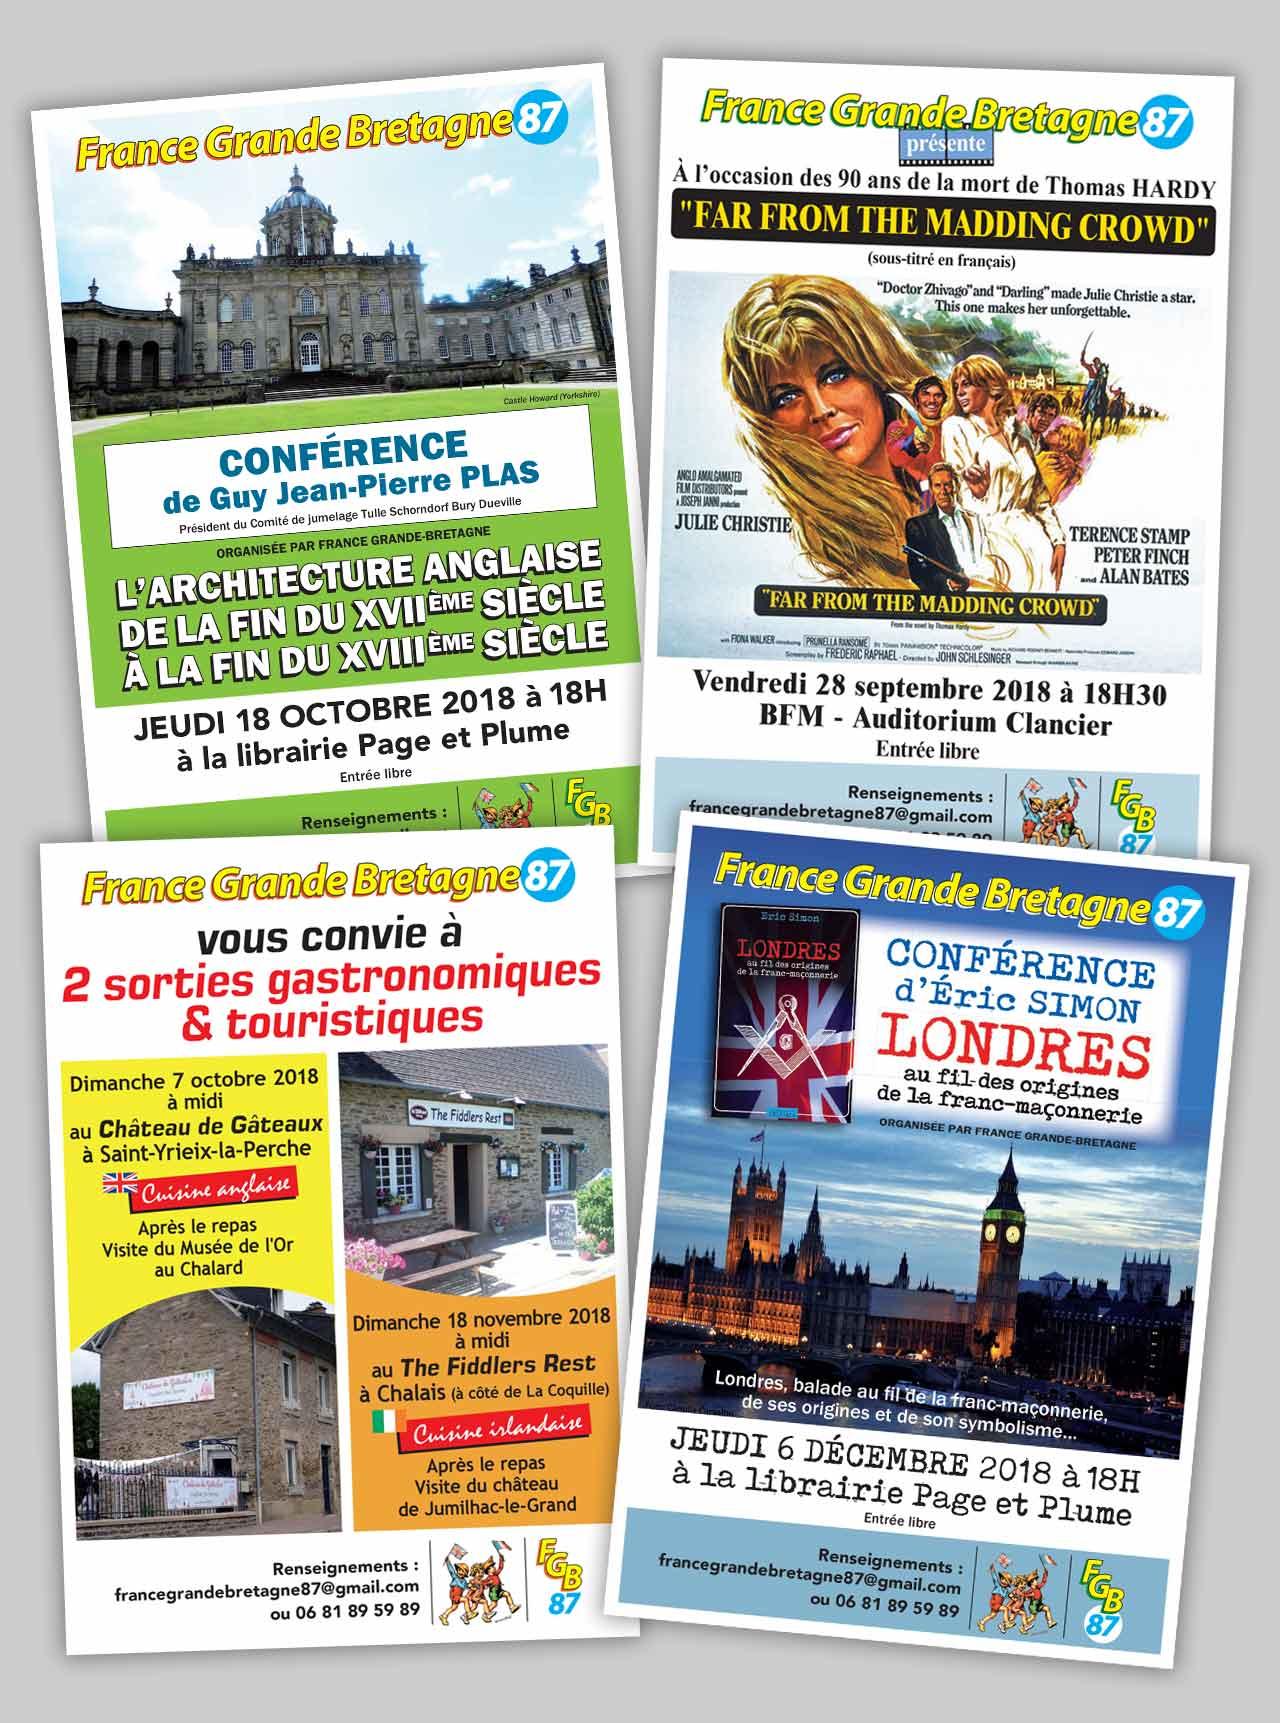 Affiches-et-flyers-France-Grande-Bretagne Limoges-2018 Marc-André conférences films sorties gastronomiques Guy Jean-Pierre Plas Eric Simon Thomas Hardy Far from the madding crown